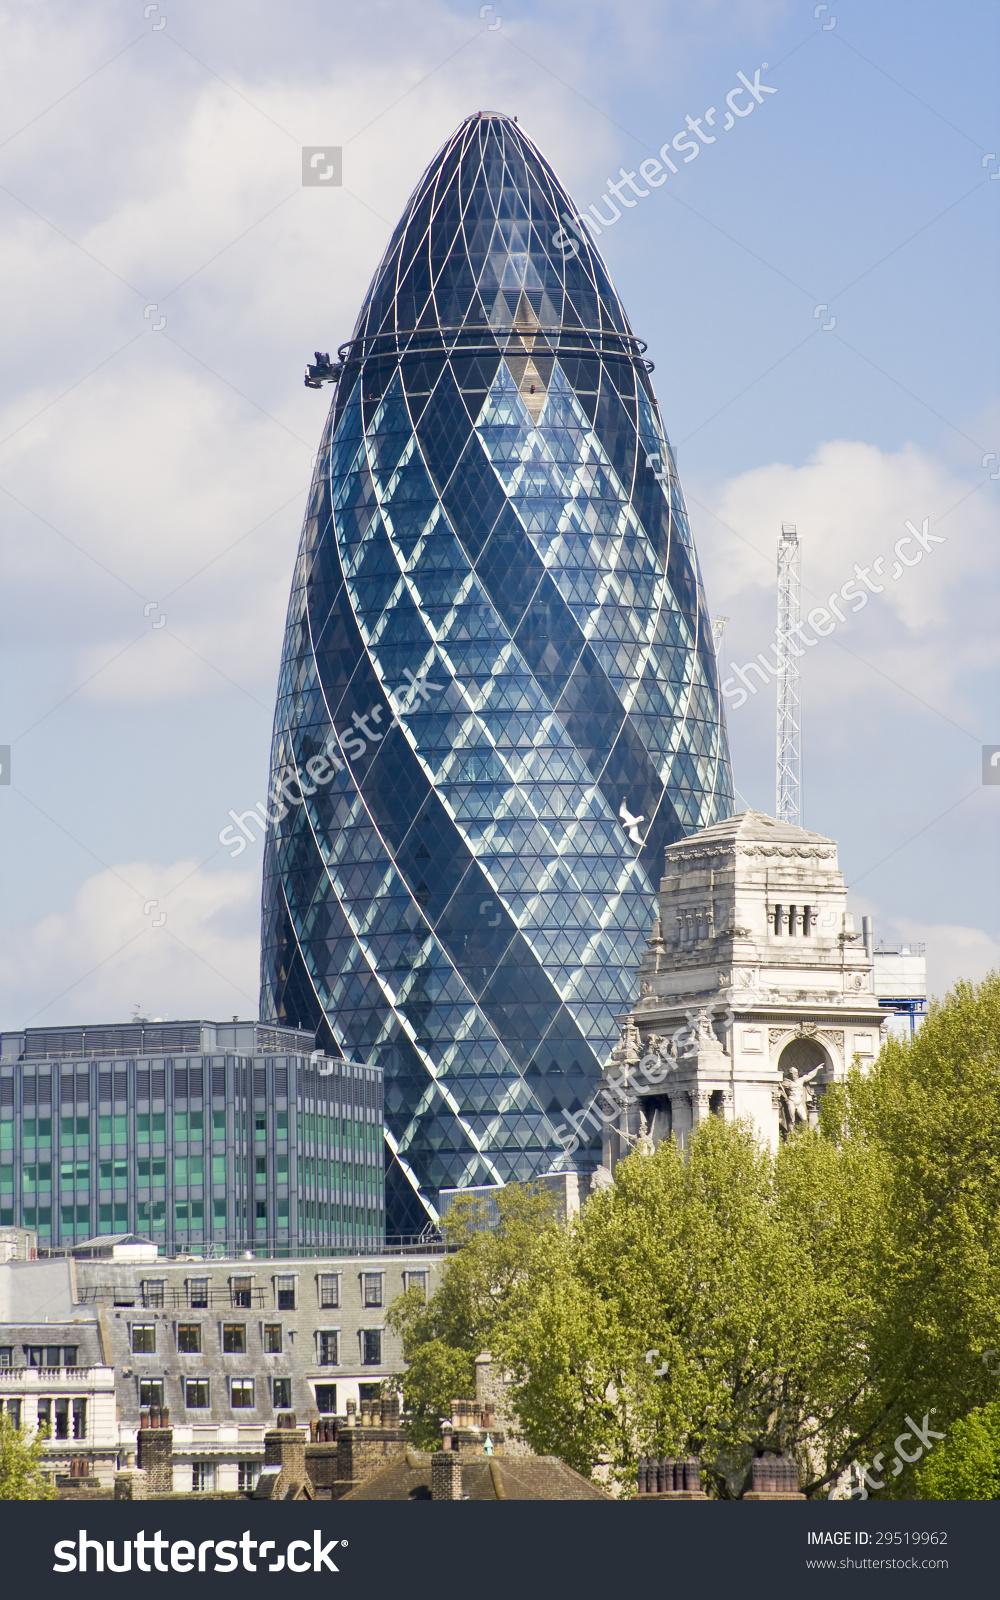 Gherkin Skyscraper London Stock Photo 29519962.